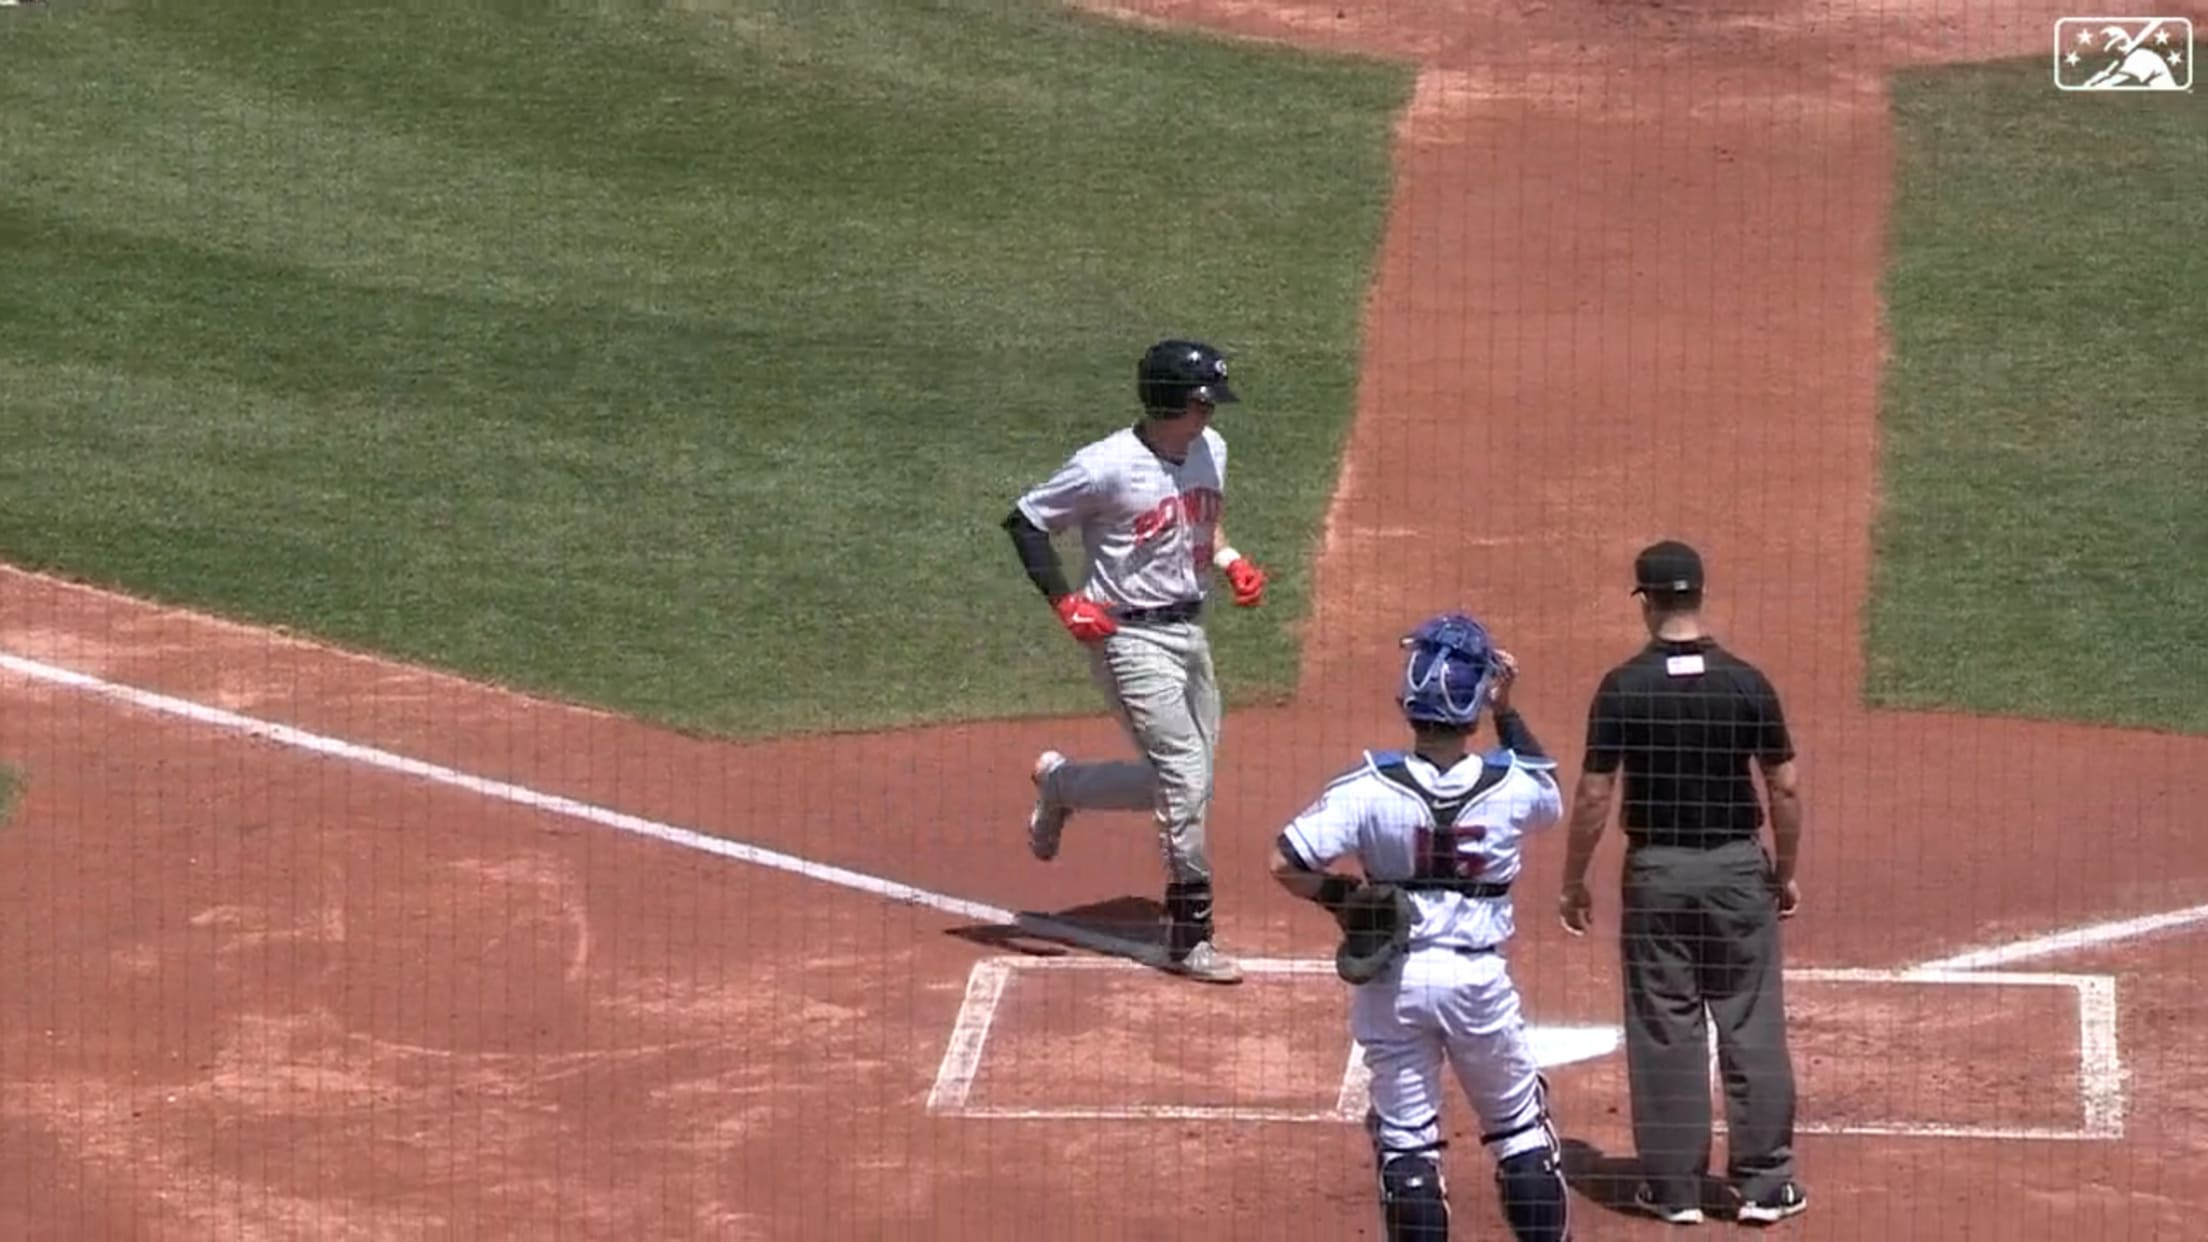 Adley Rutschman's 10th home run